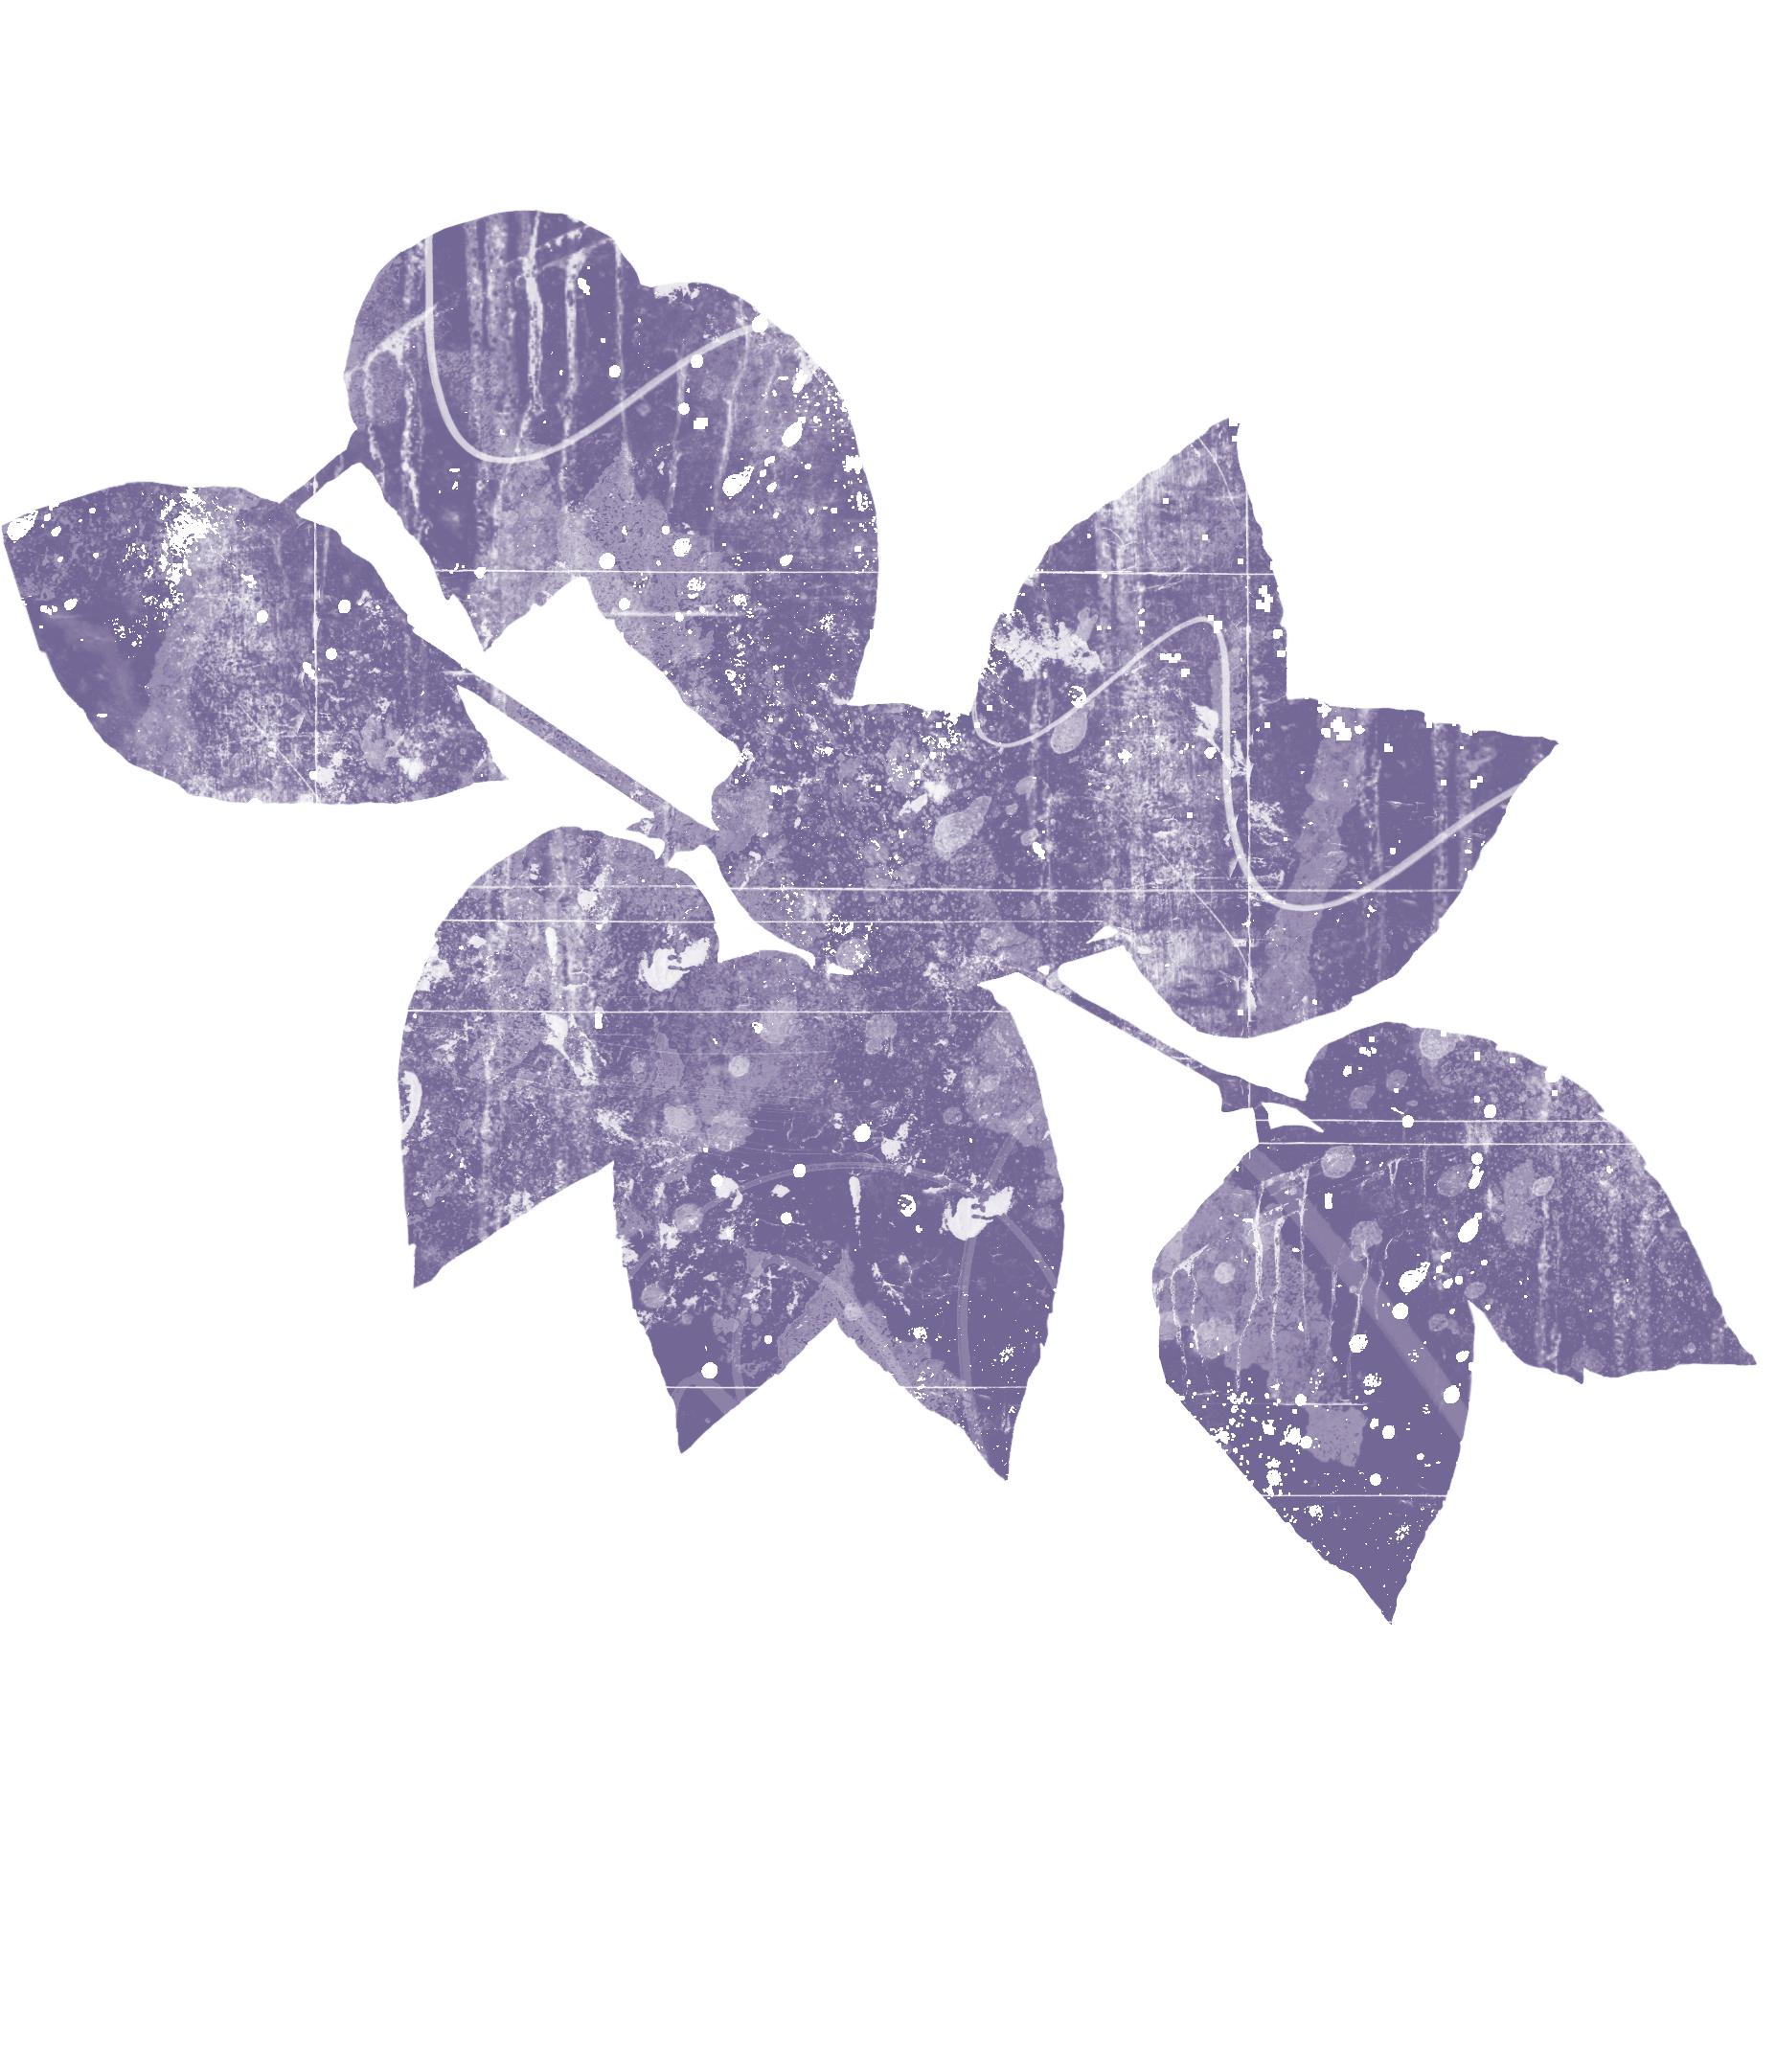 Leaf_MB.jpg